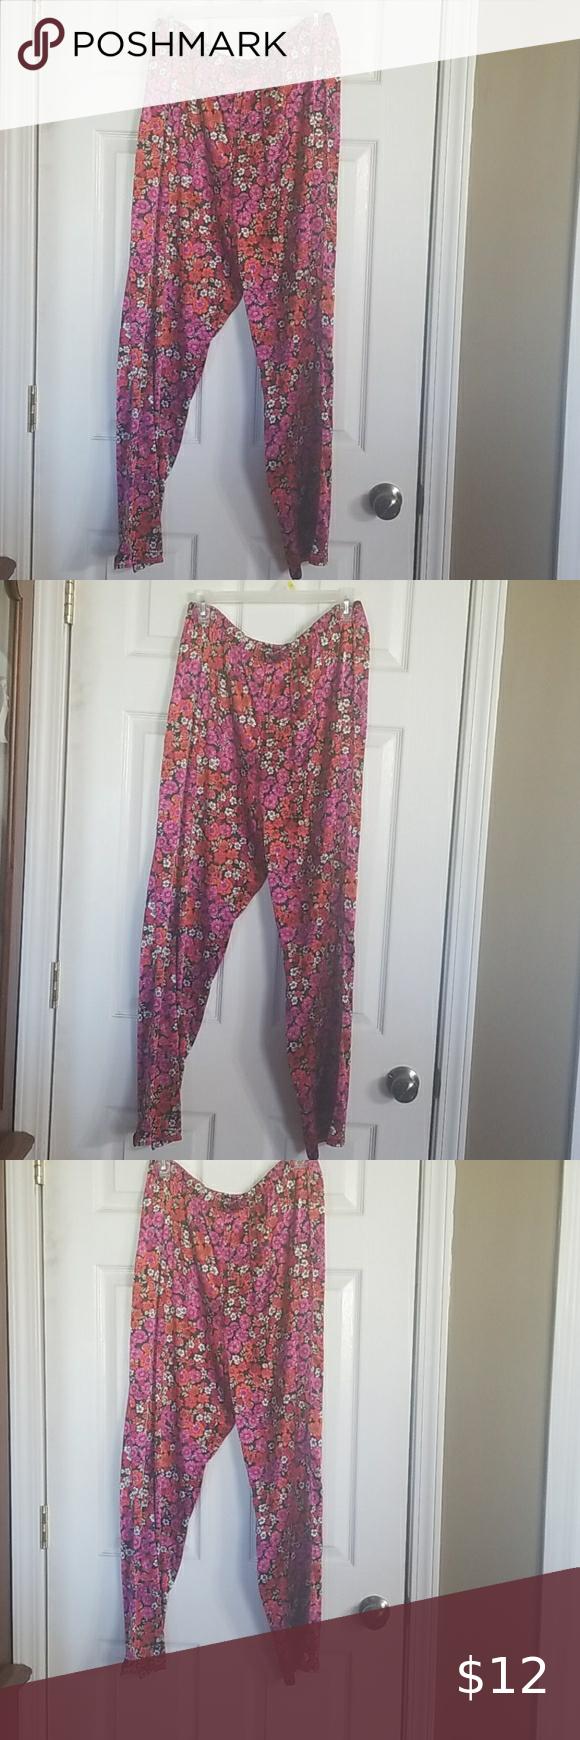 Pajama bottoms size Medium very silky and like new